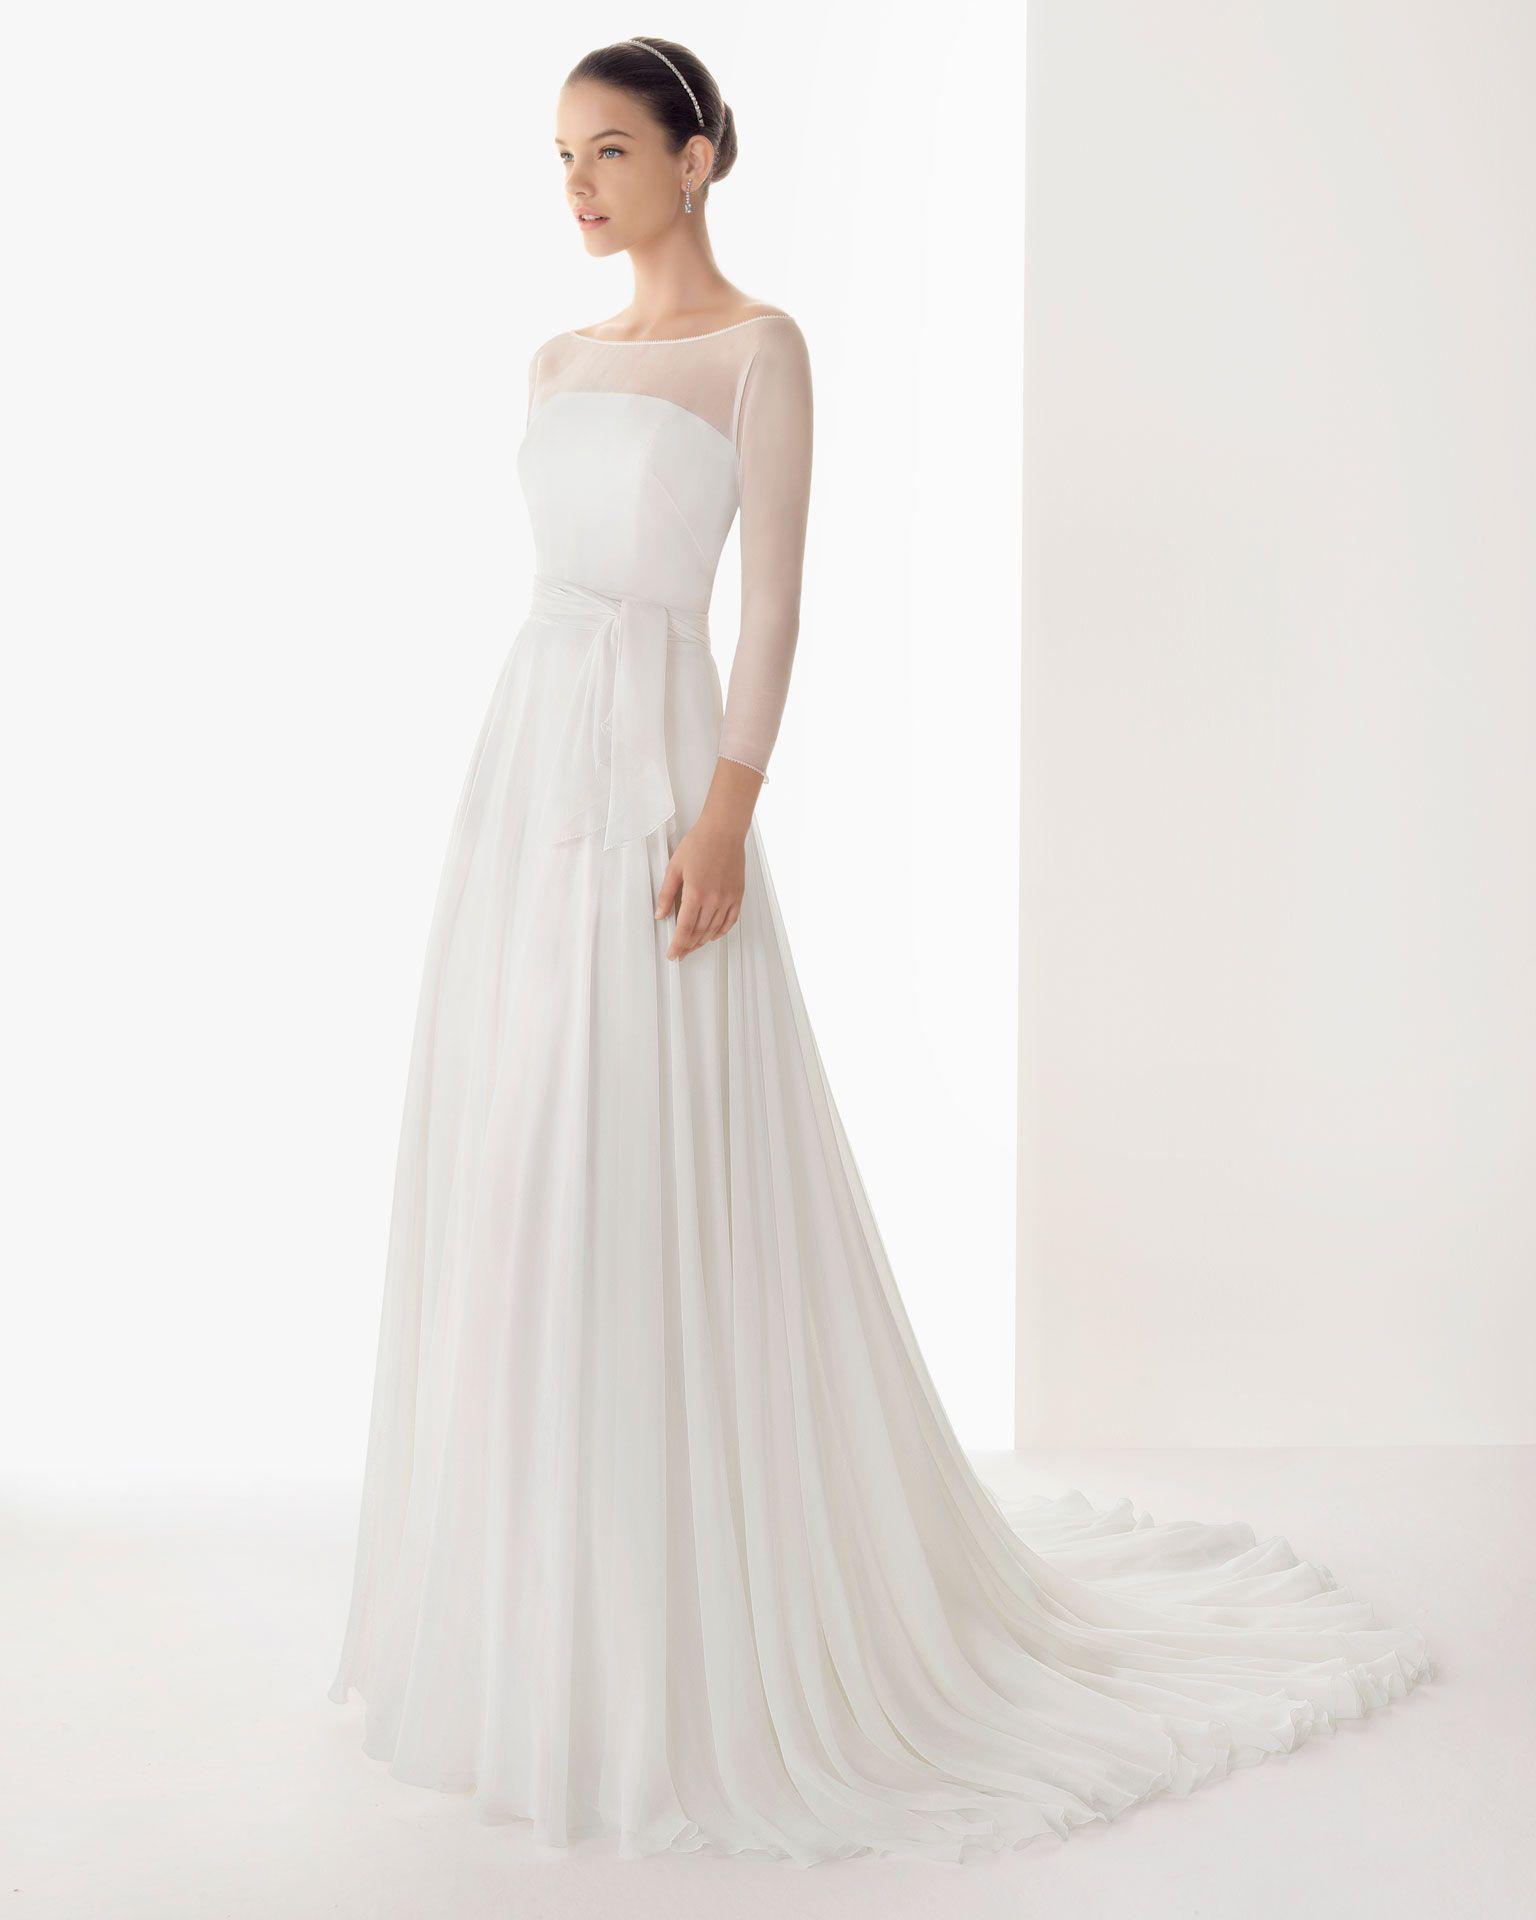 2013 collection 238 / BEMOL-Online Wedding Dress shop ,low price ...